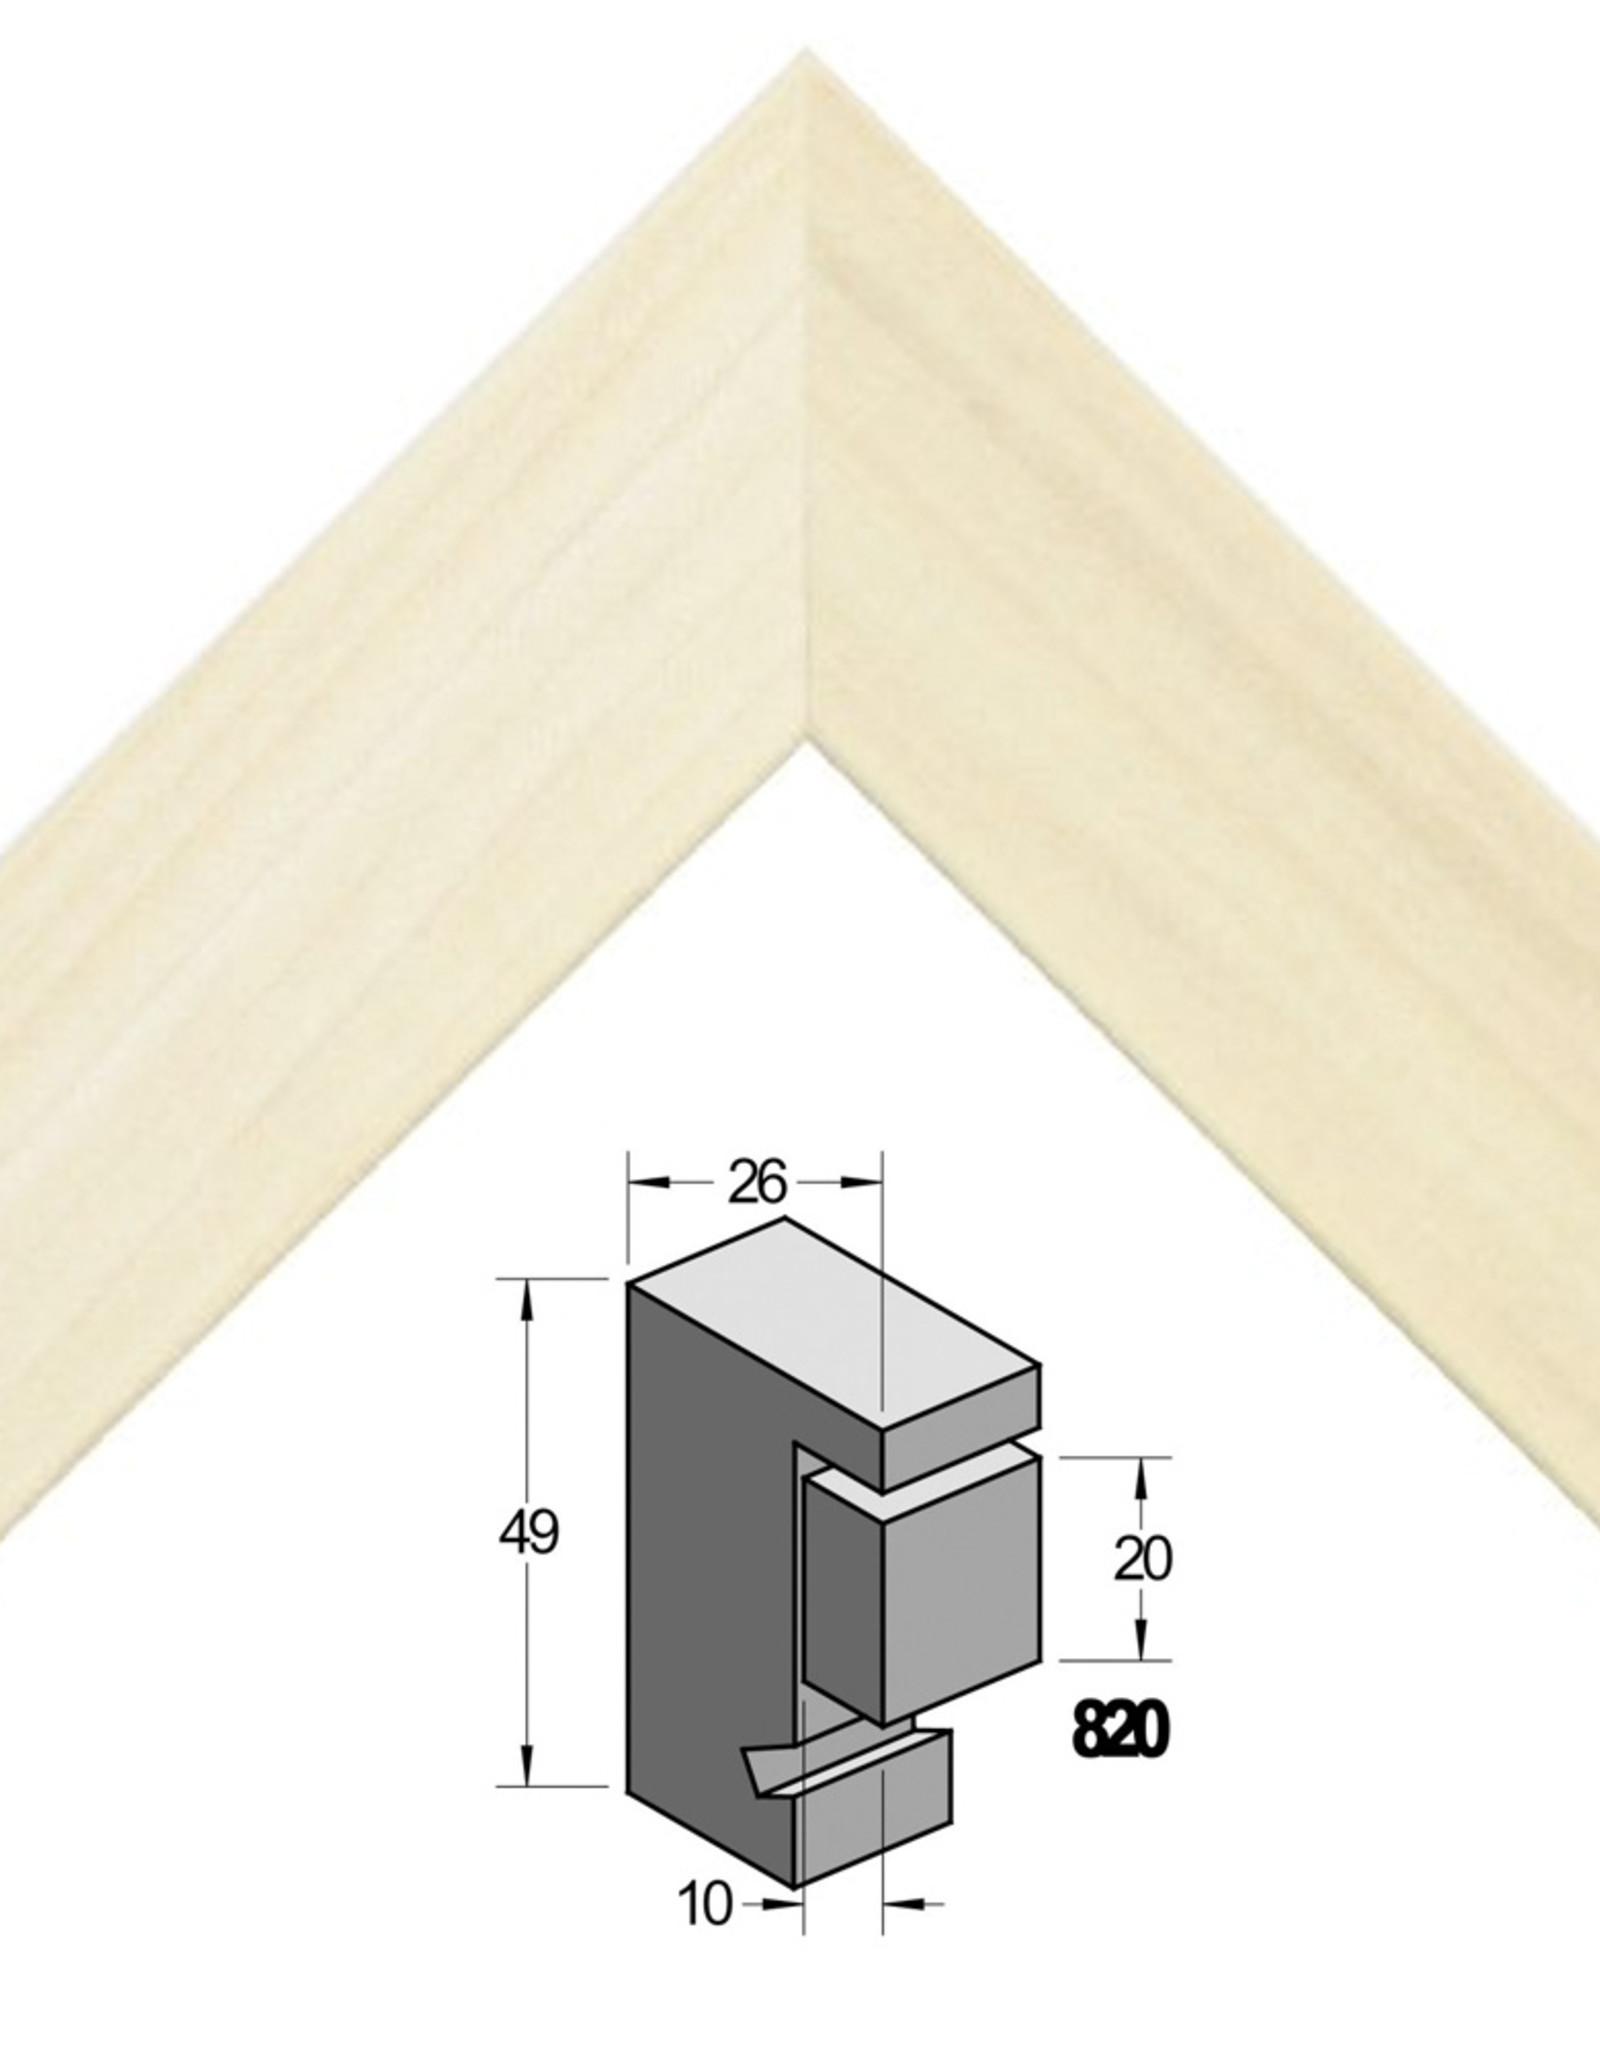 2x Wissellijst Verdiept 70x90cm Populier Ongelakt Barth profiel 26x49mm(820) sponning 20mm